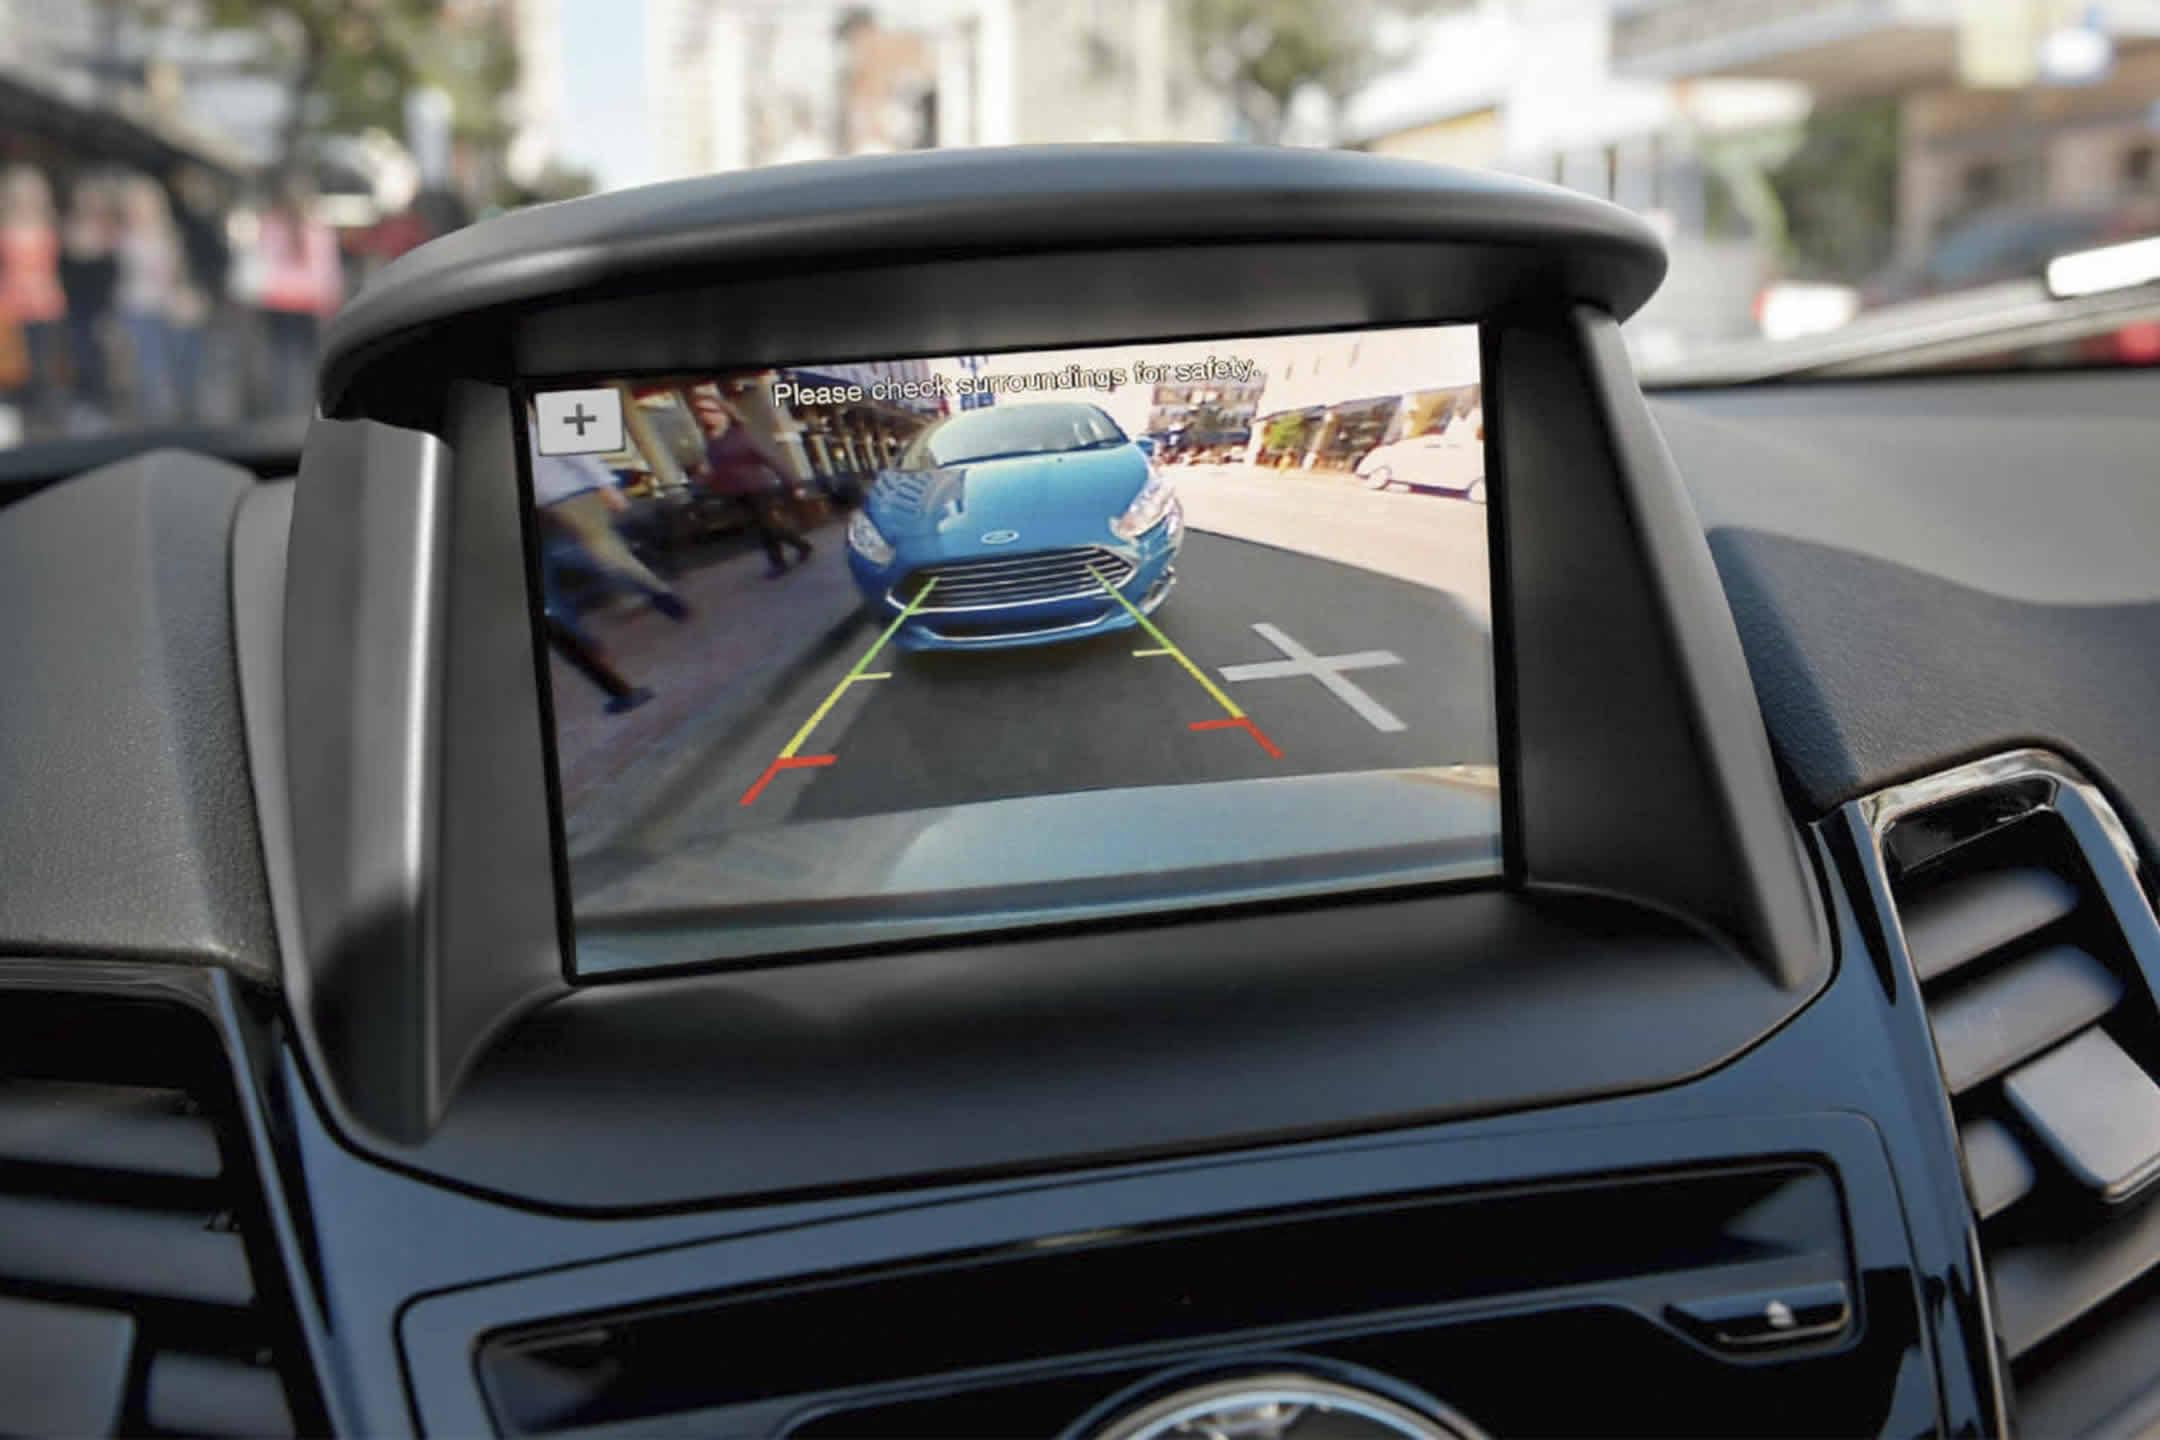 2017 Ford Fiesta Rearview Camera Beach Buick Verano Rear View